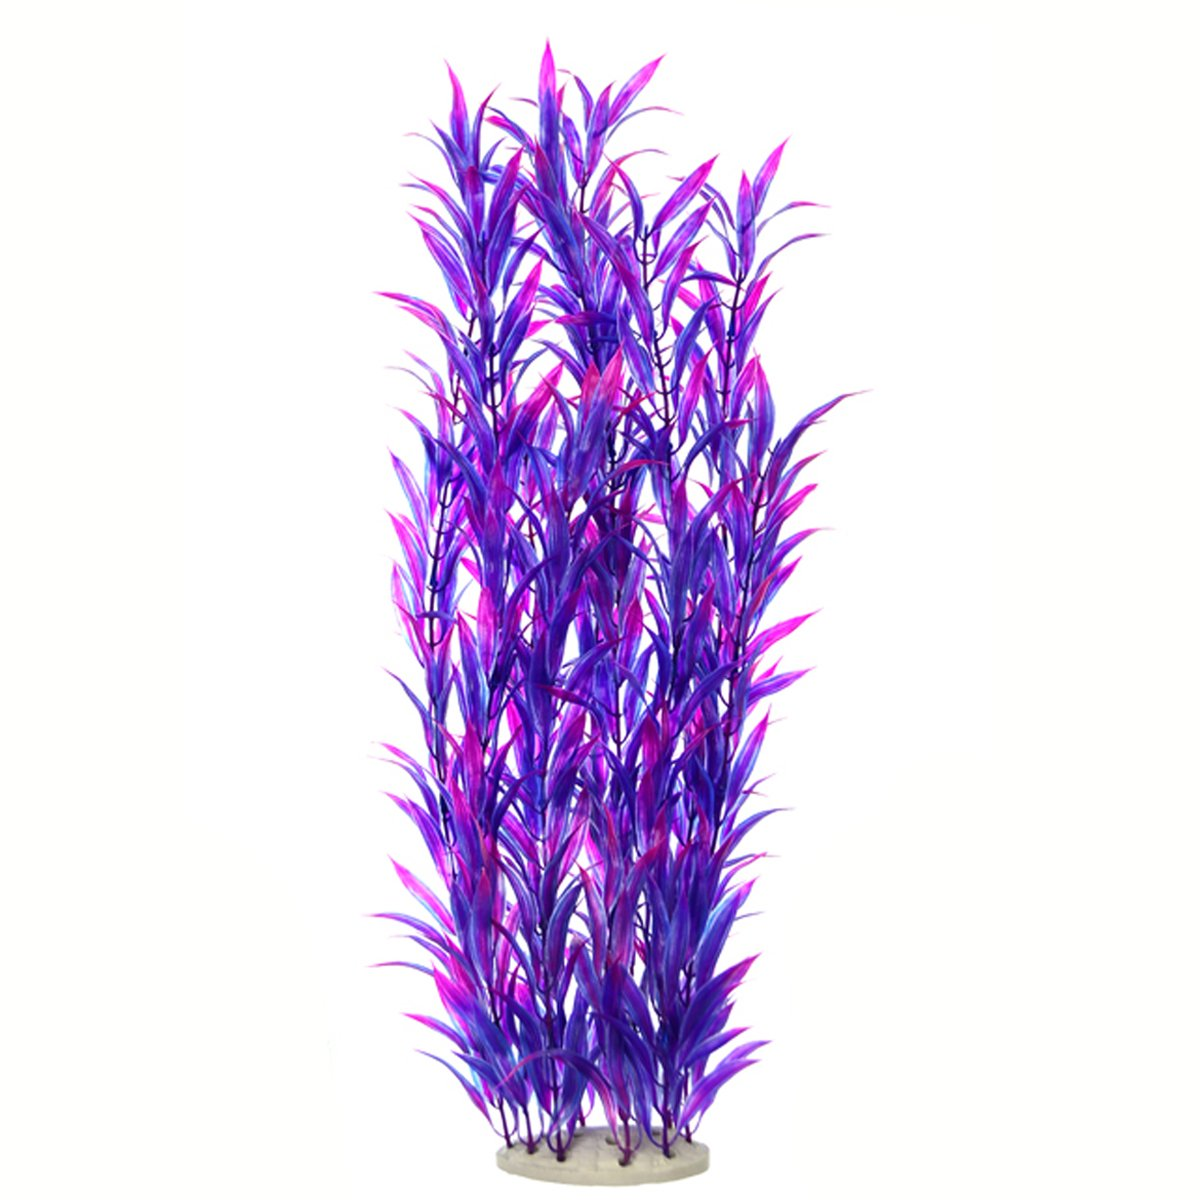 Lantian Tall Aquarium Plastic Plants Natural Fish Tank Decorations Bright Artificial Fake Plants 21 inches J002